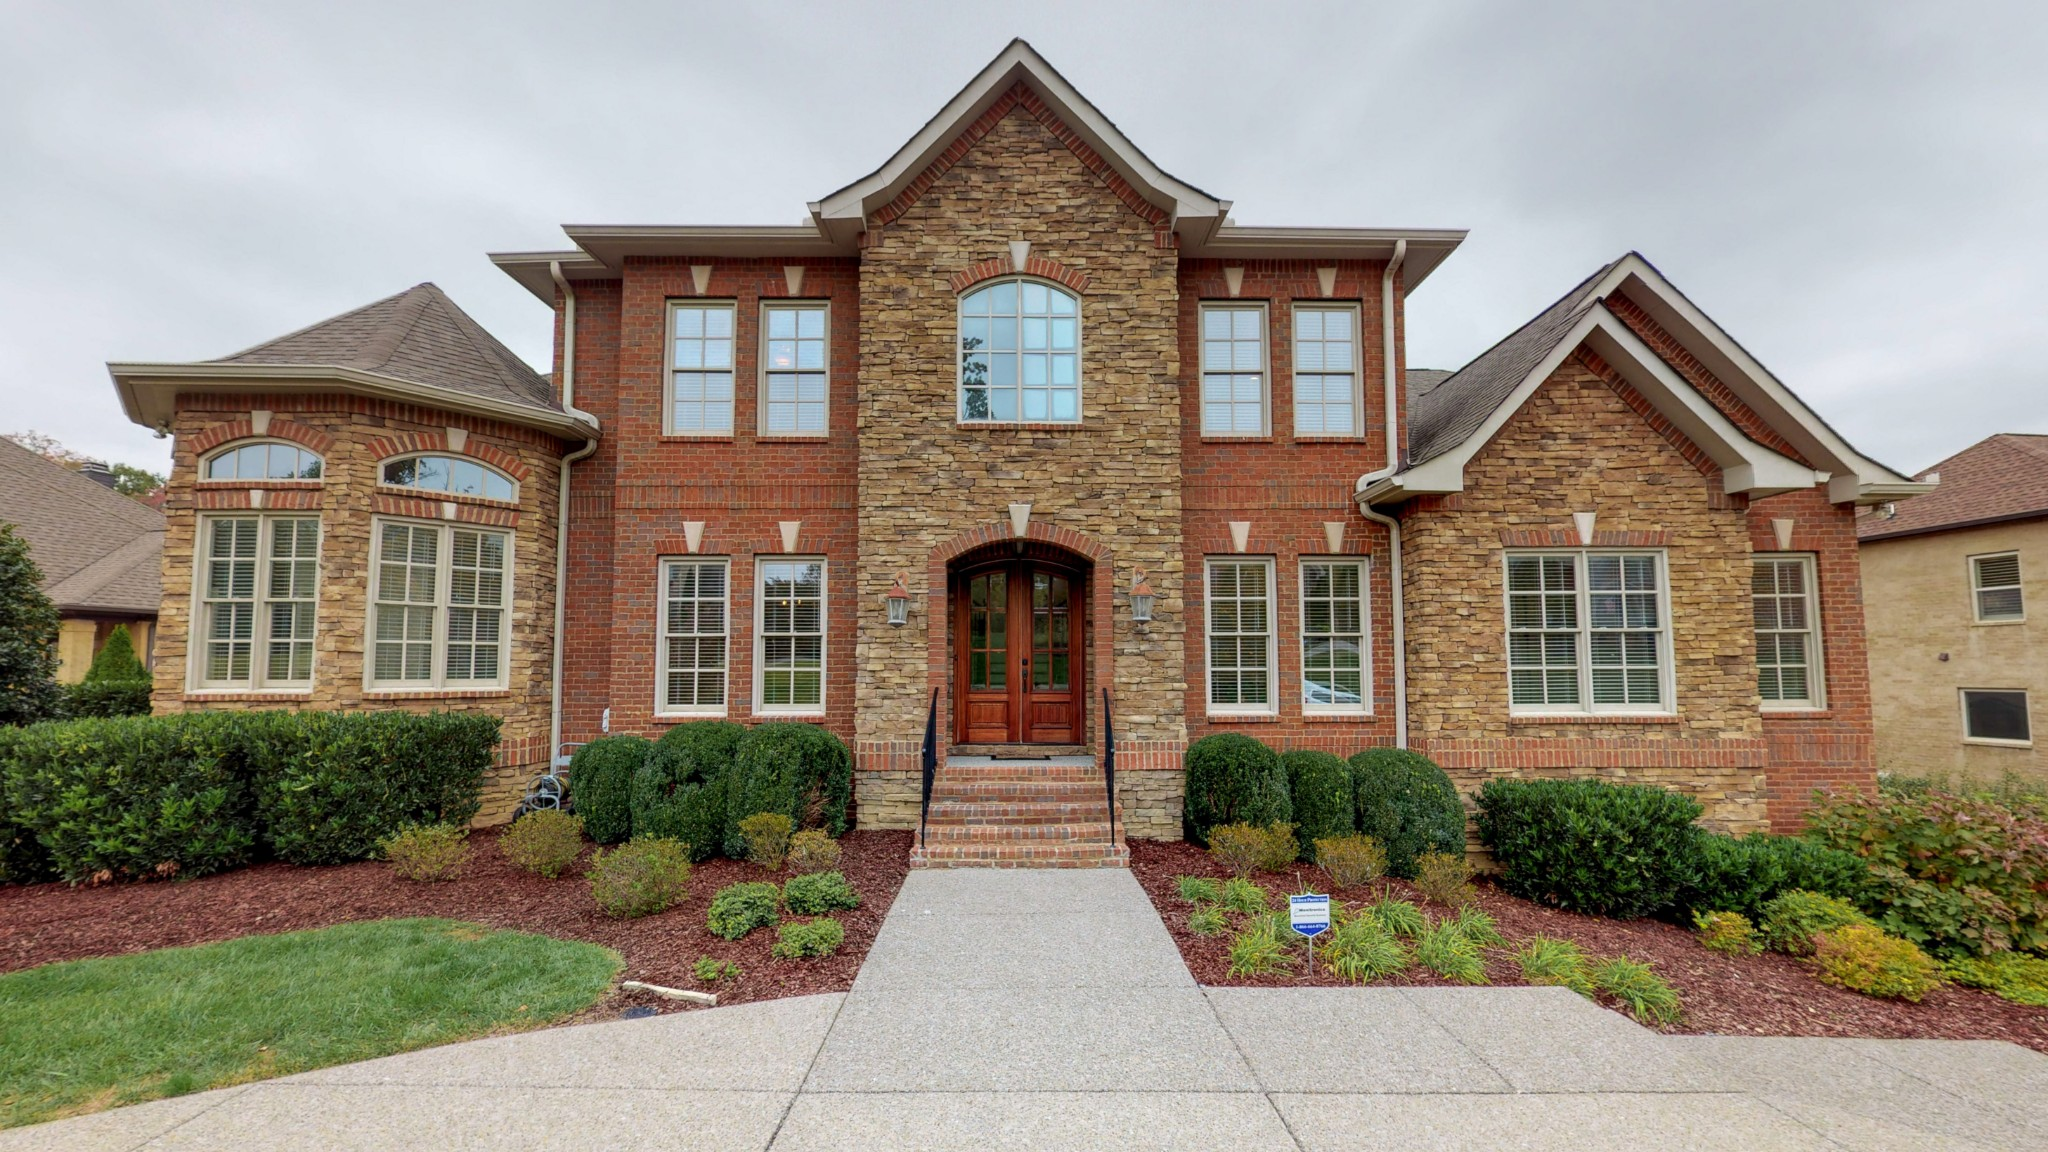 9632 Portofino Dr, Brentwood, TN 37027 - Brentwood, TN real estate listing